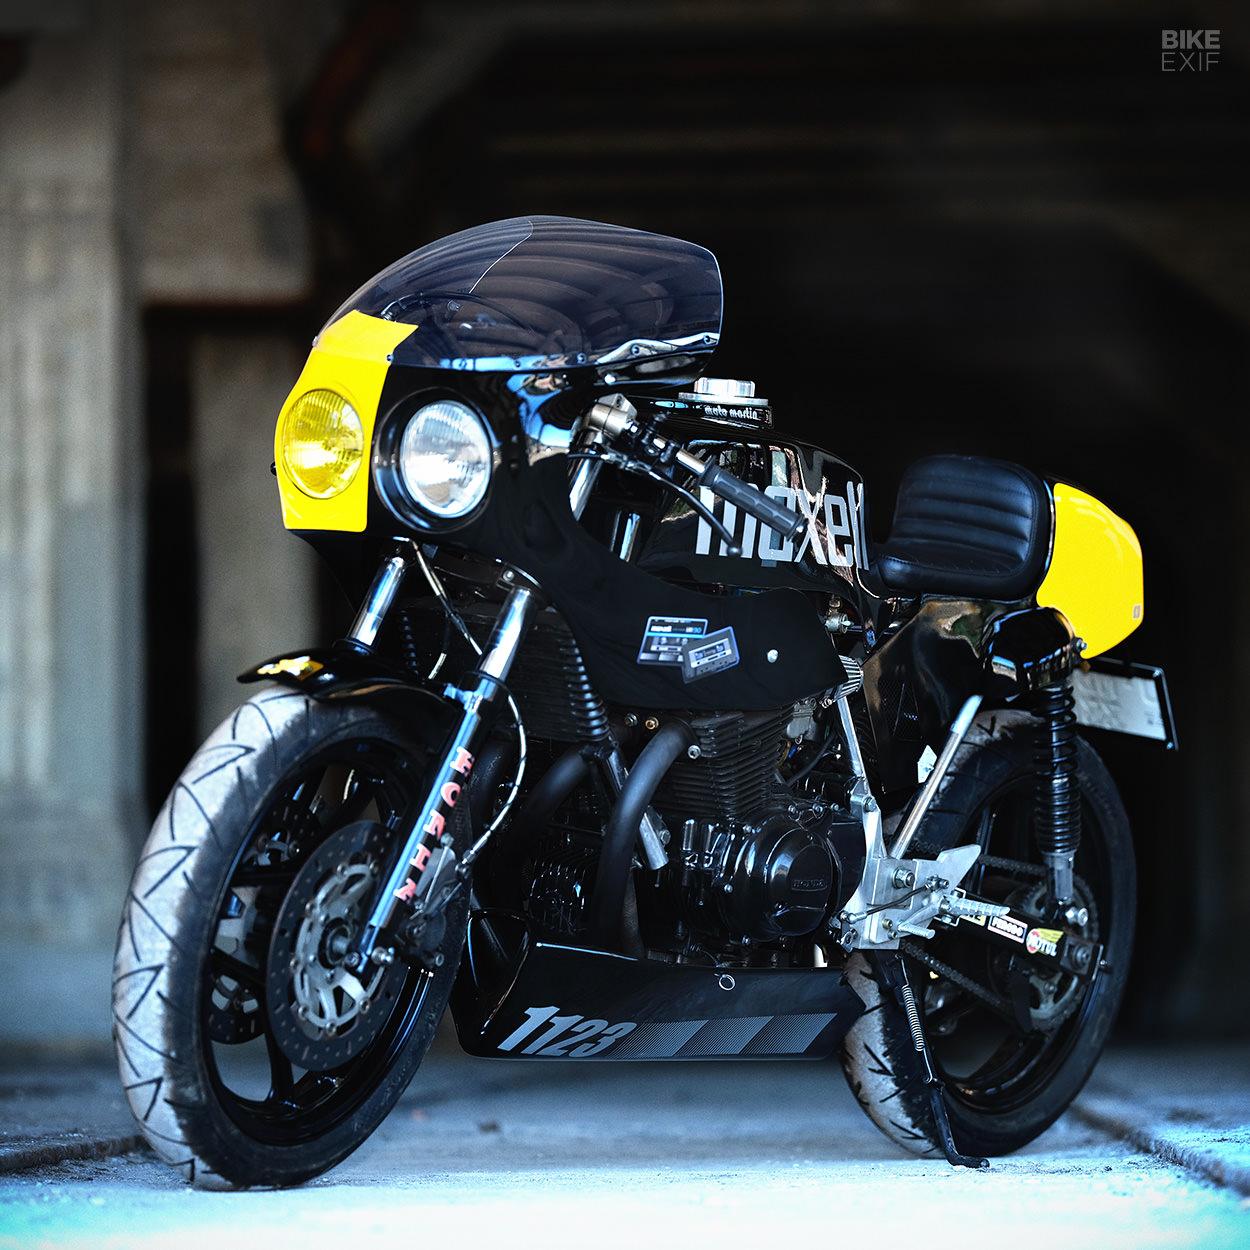 Honda-powered Moto Martin endurance race bike